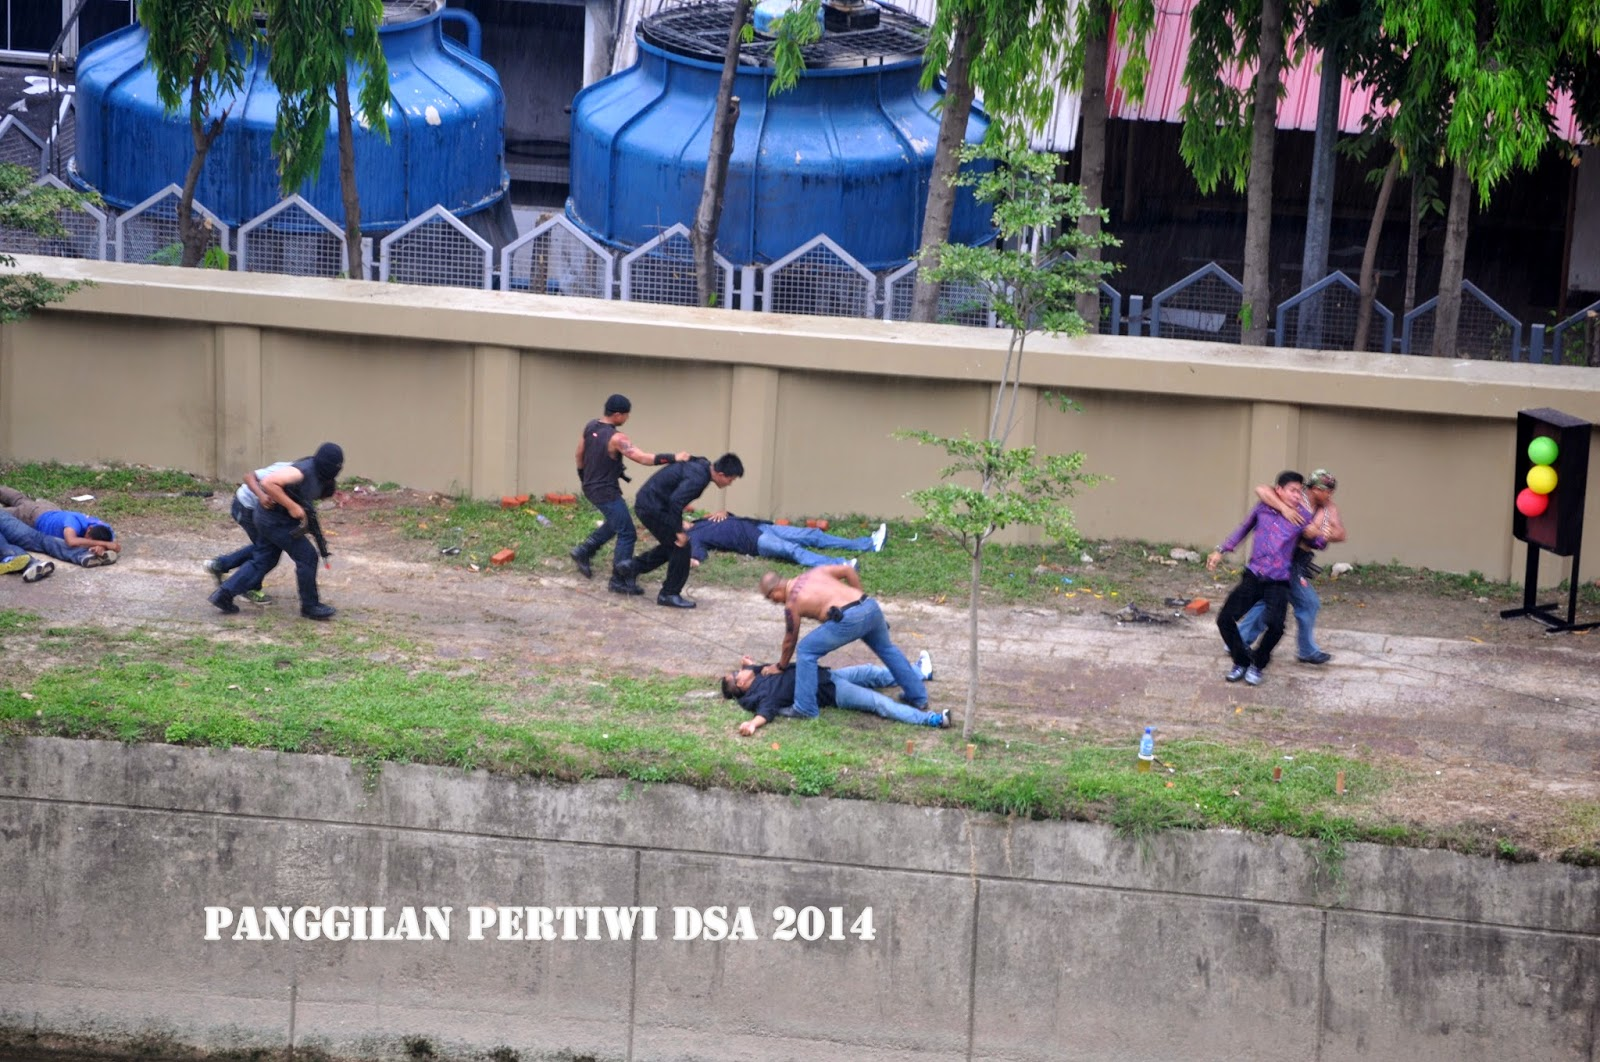 Bodyguard Services Kuala Lumpur